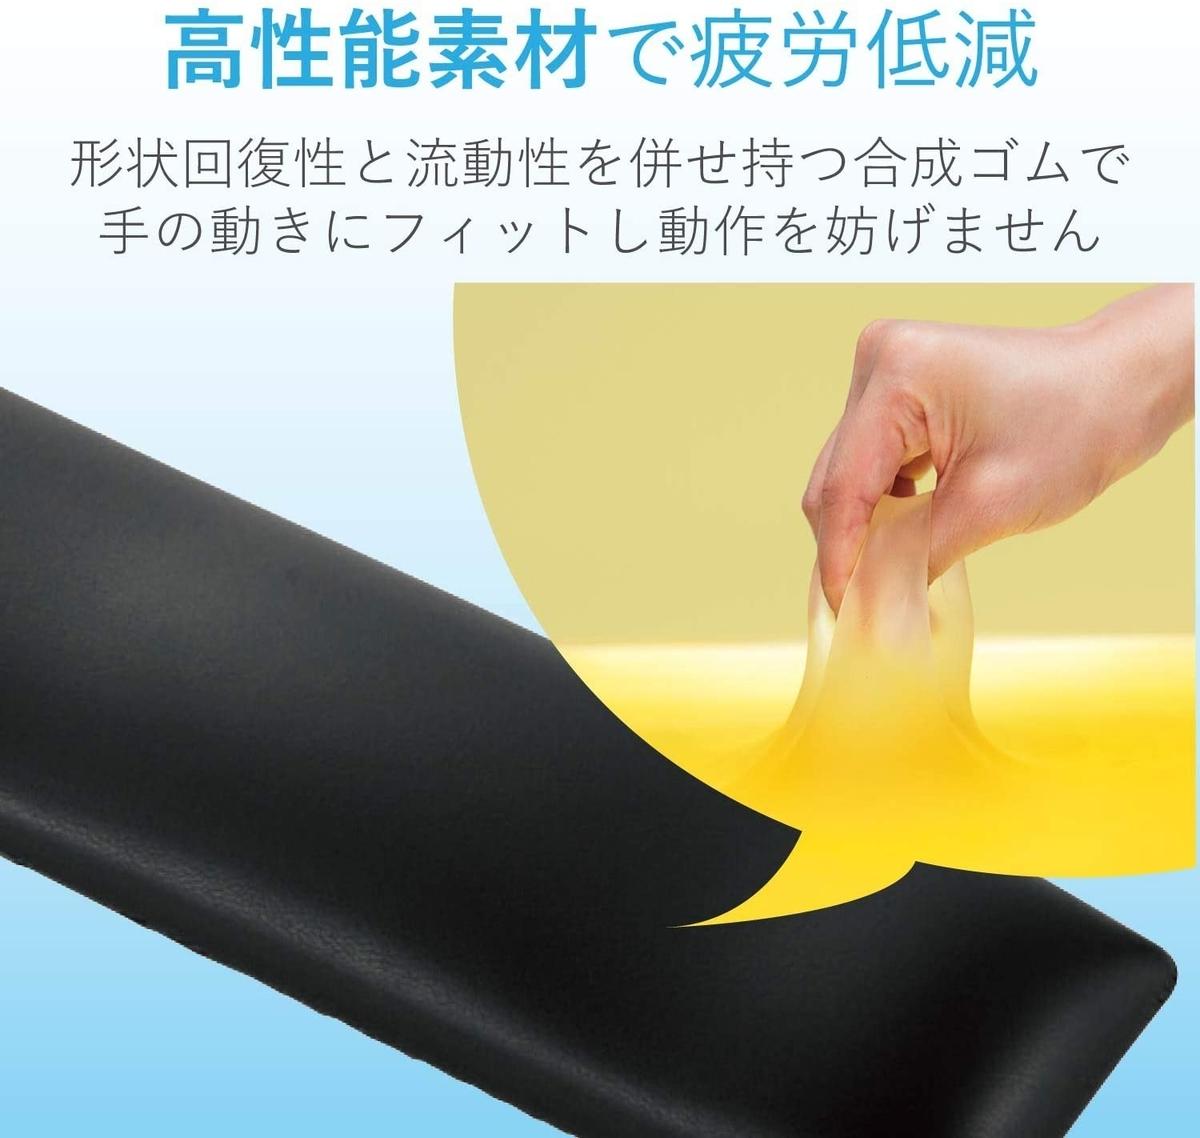 f:id:tsukasamochi:20201108033319j:plain